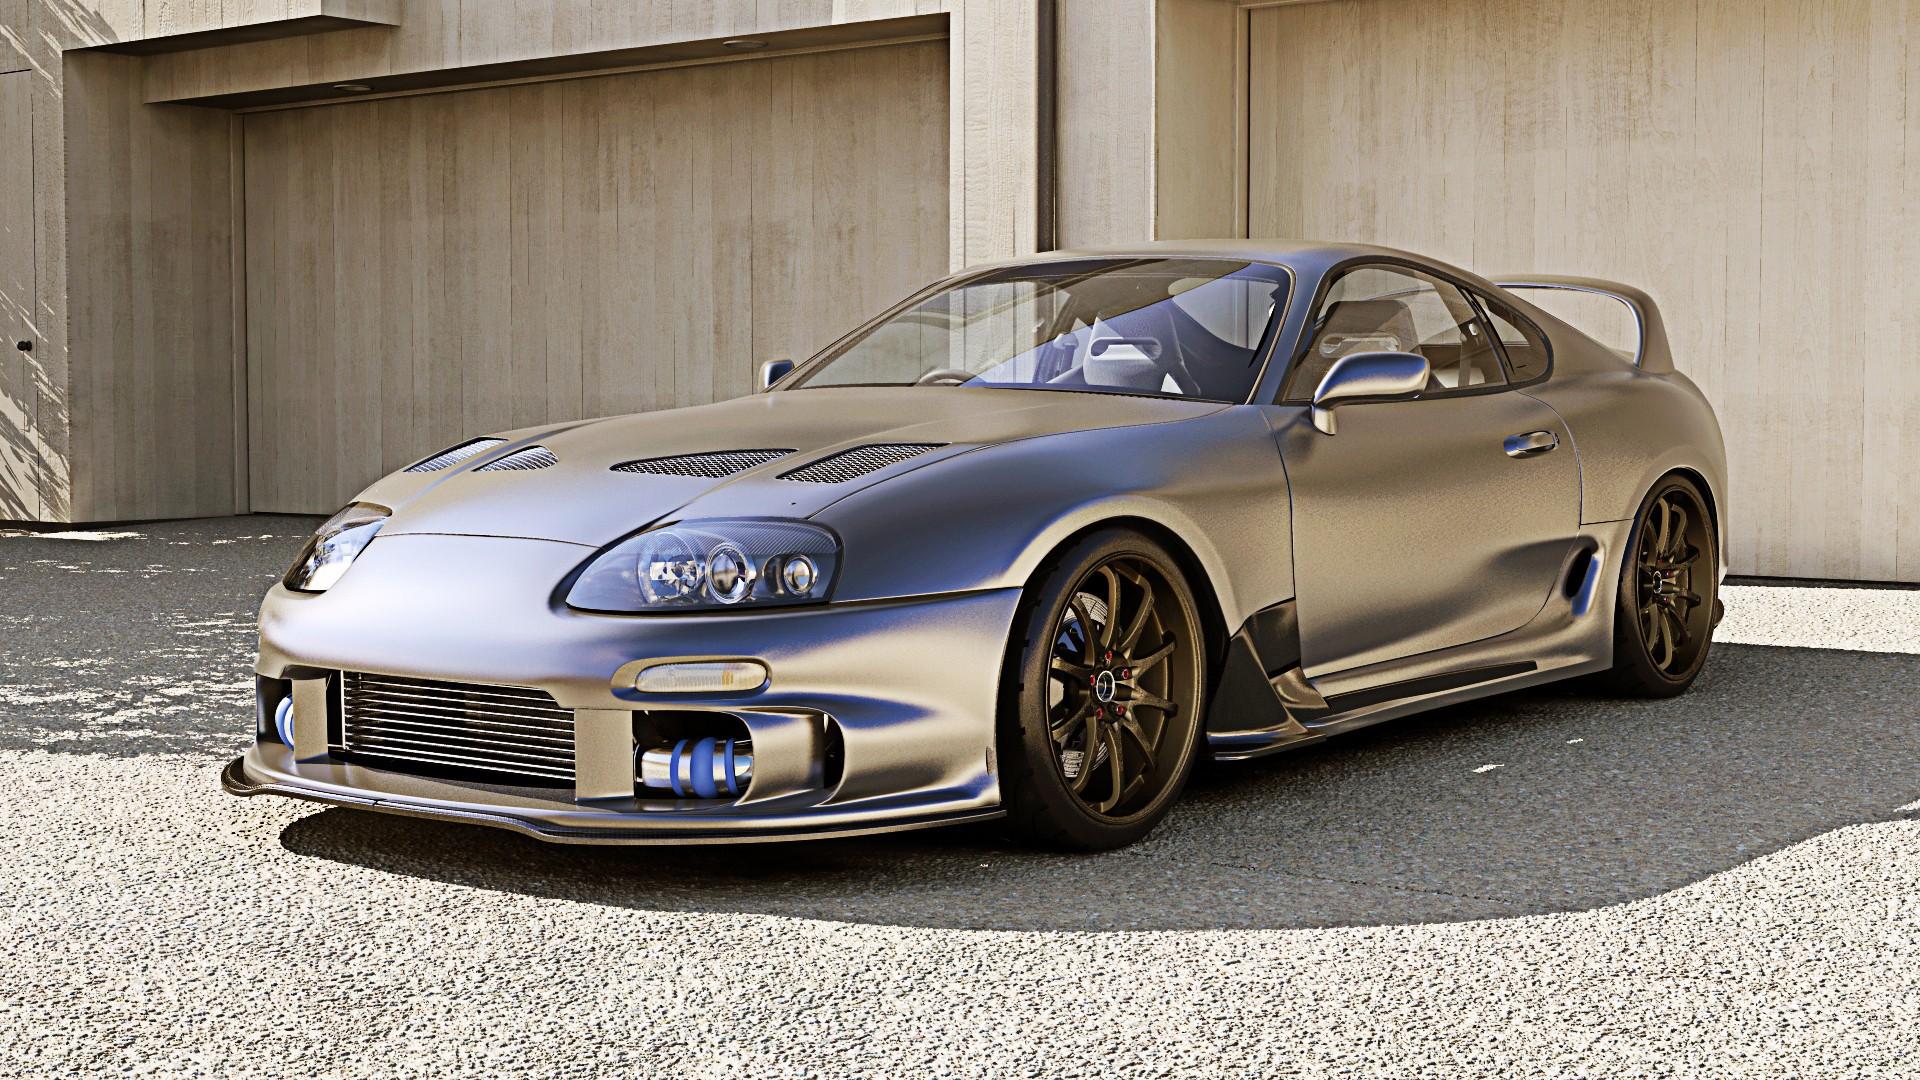 Toyota Supra Background